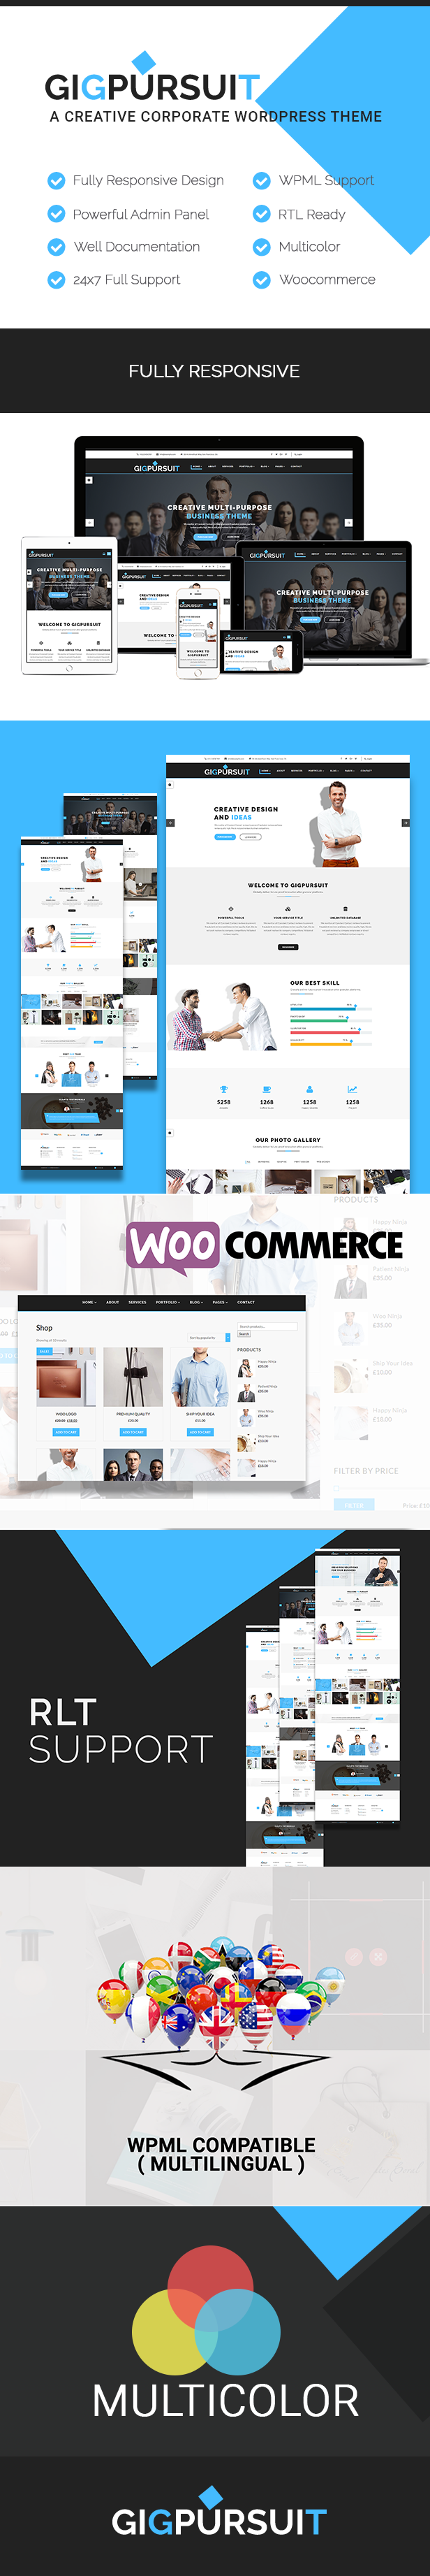 GigPursuit - Business, Corporate, Creative WordPress Theme